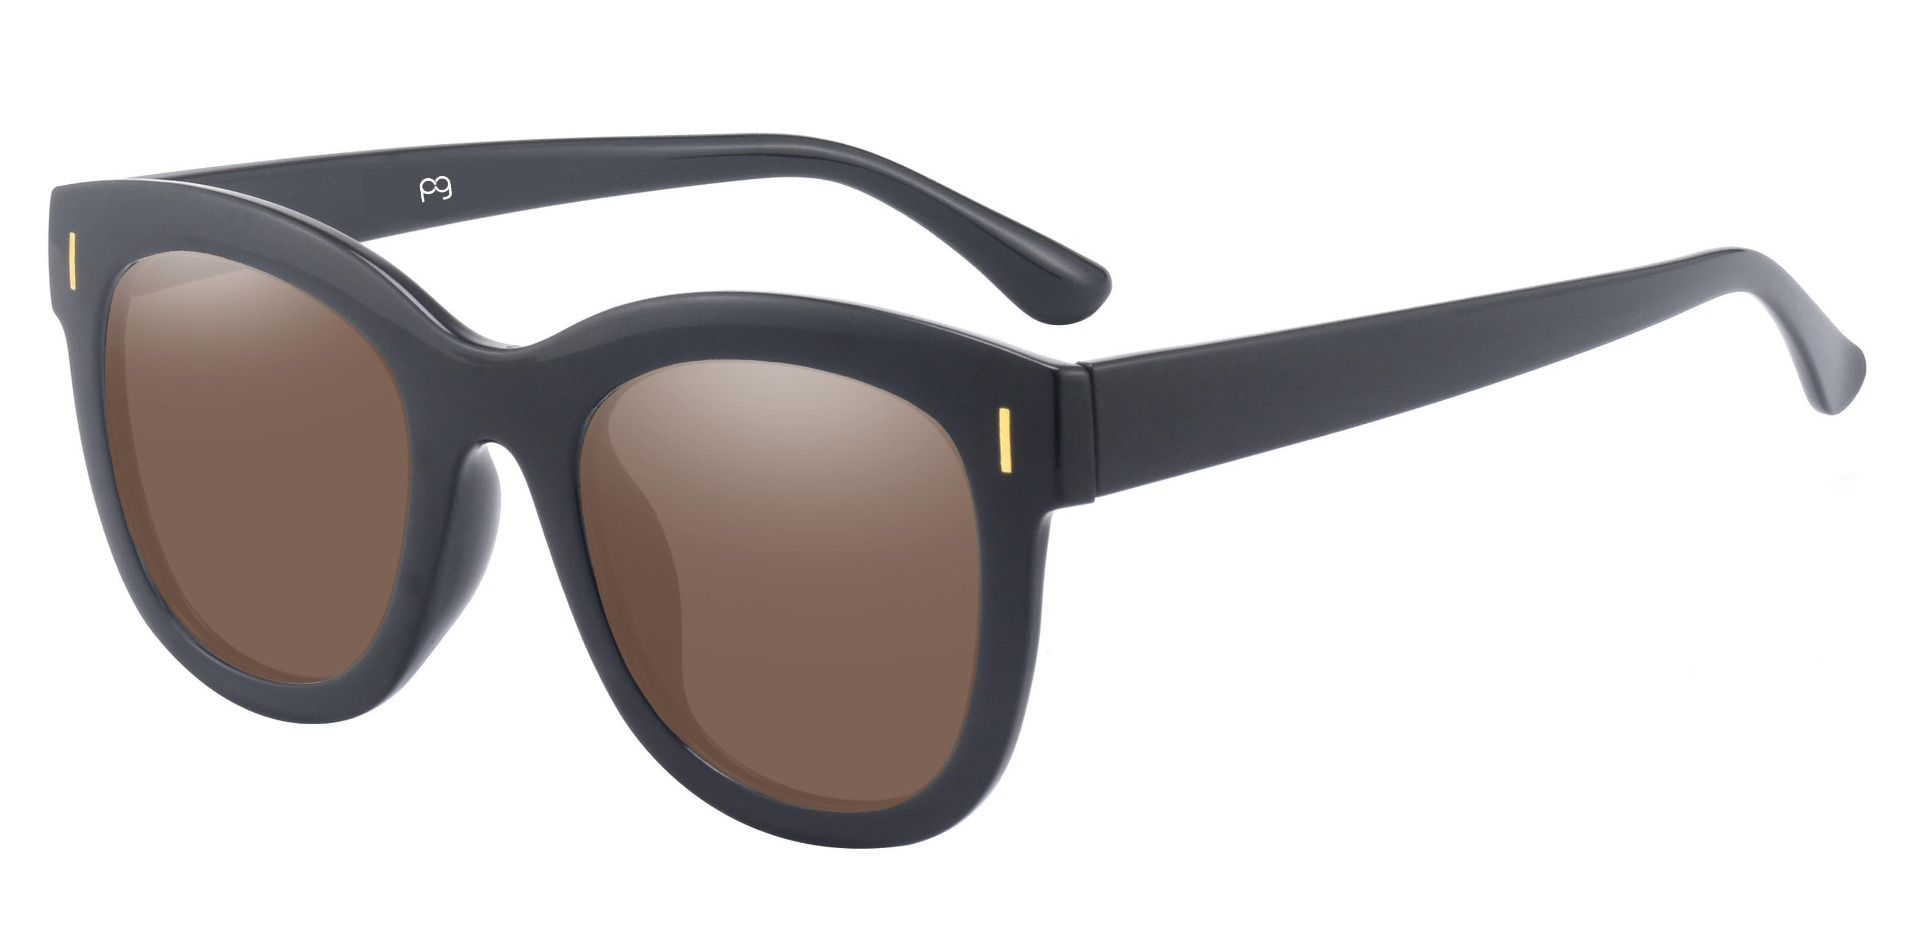 Saratoga Square Reading Sunglasses - Black Frame With Brown Lenses